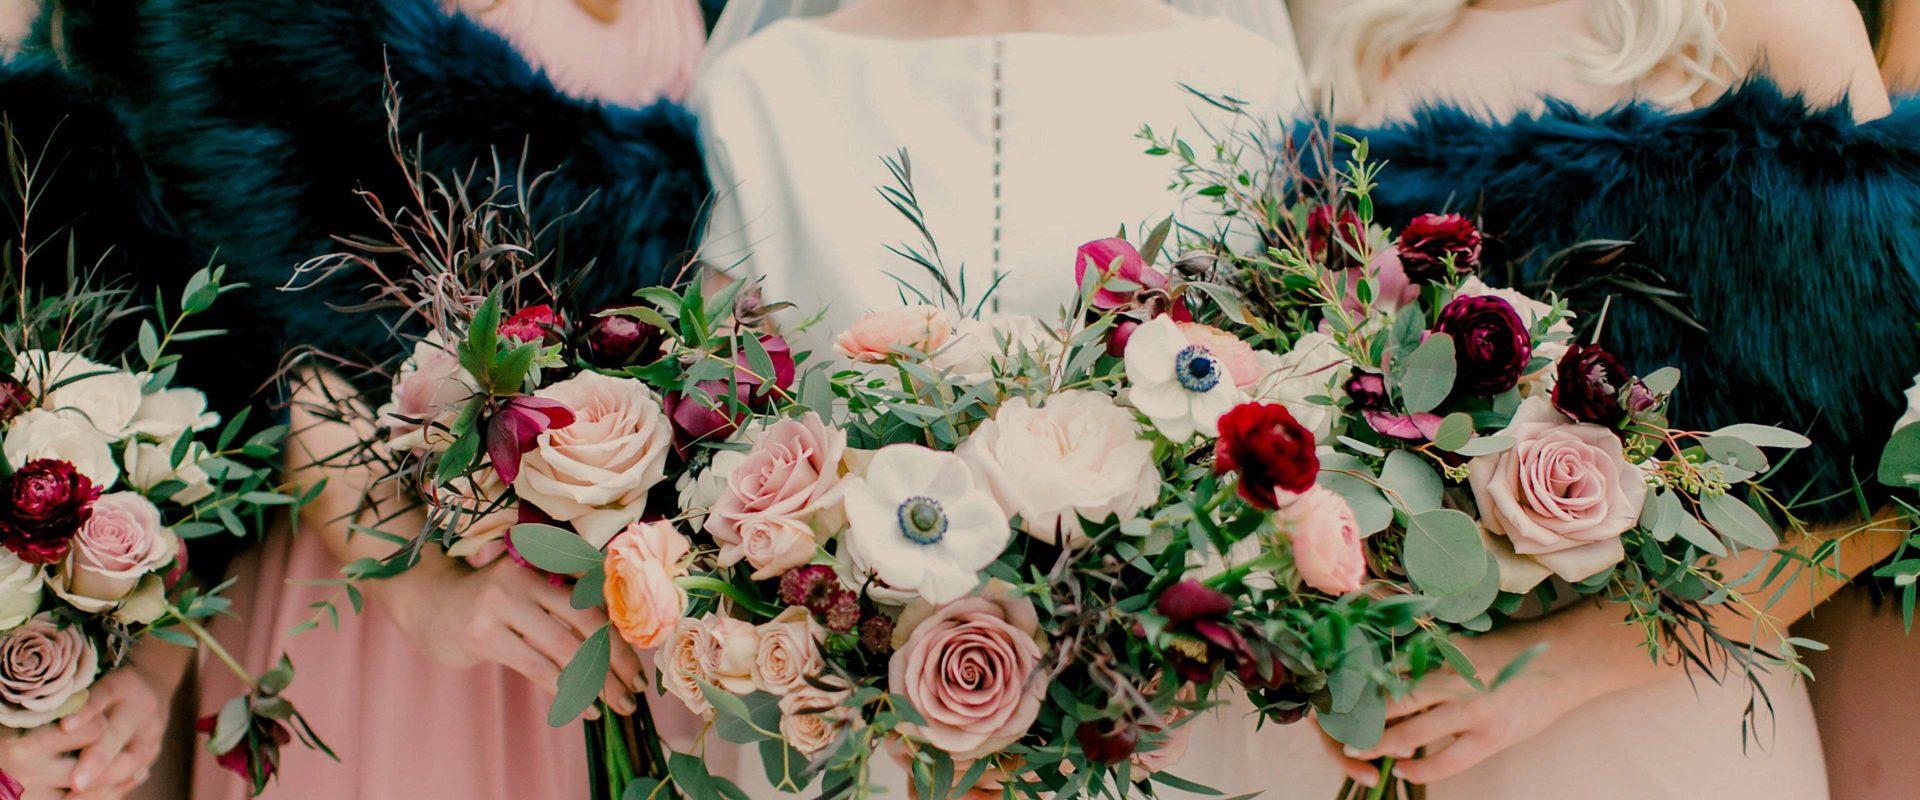 Whim Floral Packages Flower Design In Austin Tx Wedding